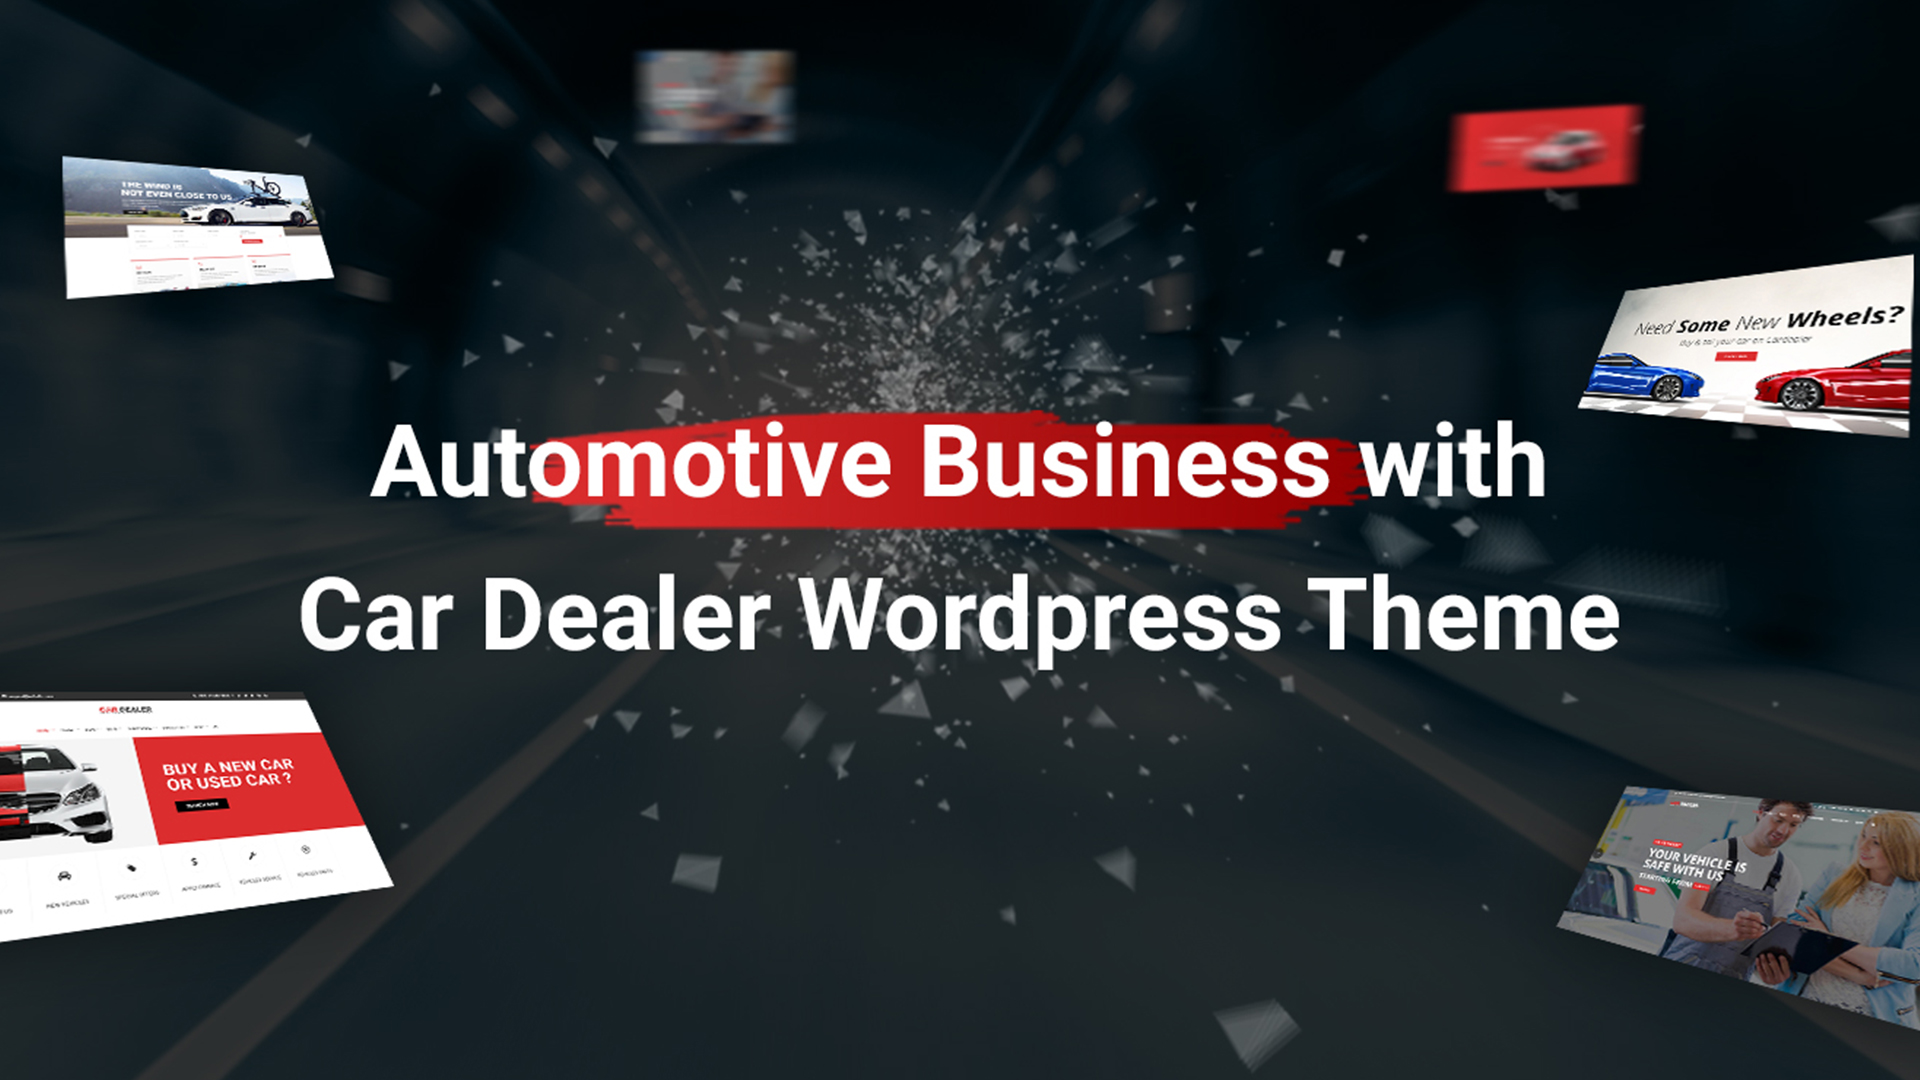 How to start a Car dealership business using the Car Dealer WordPress Theme